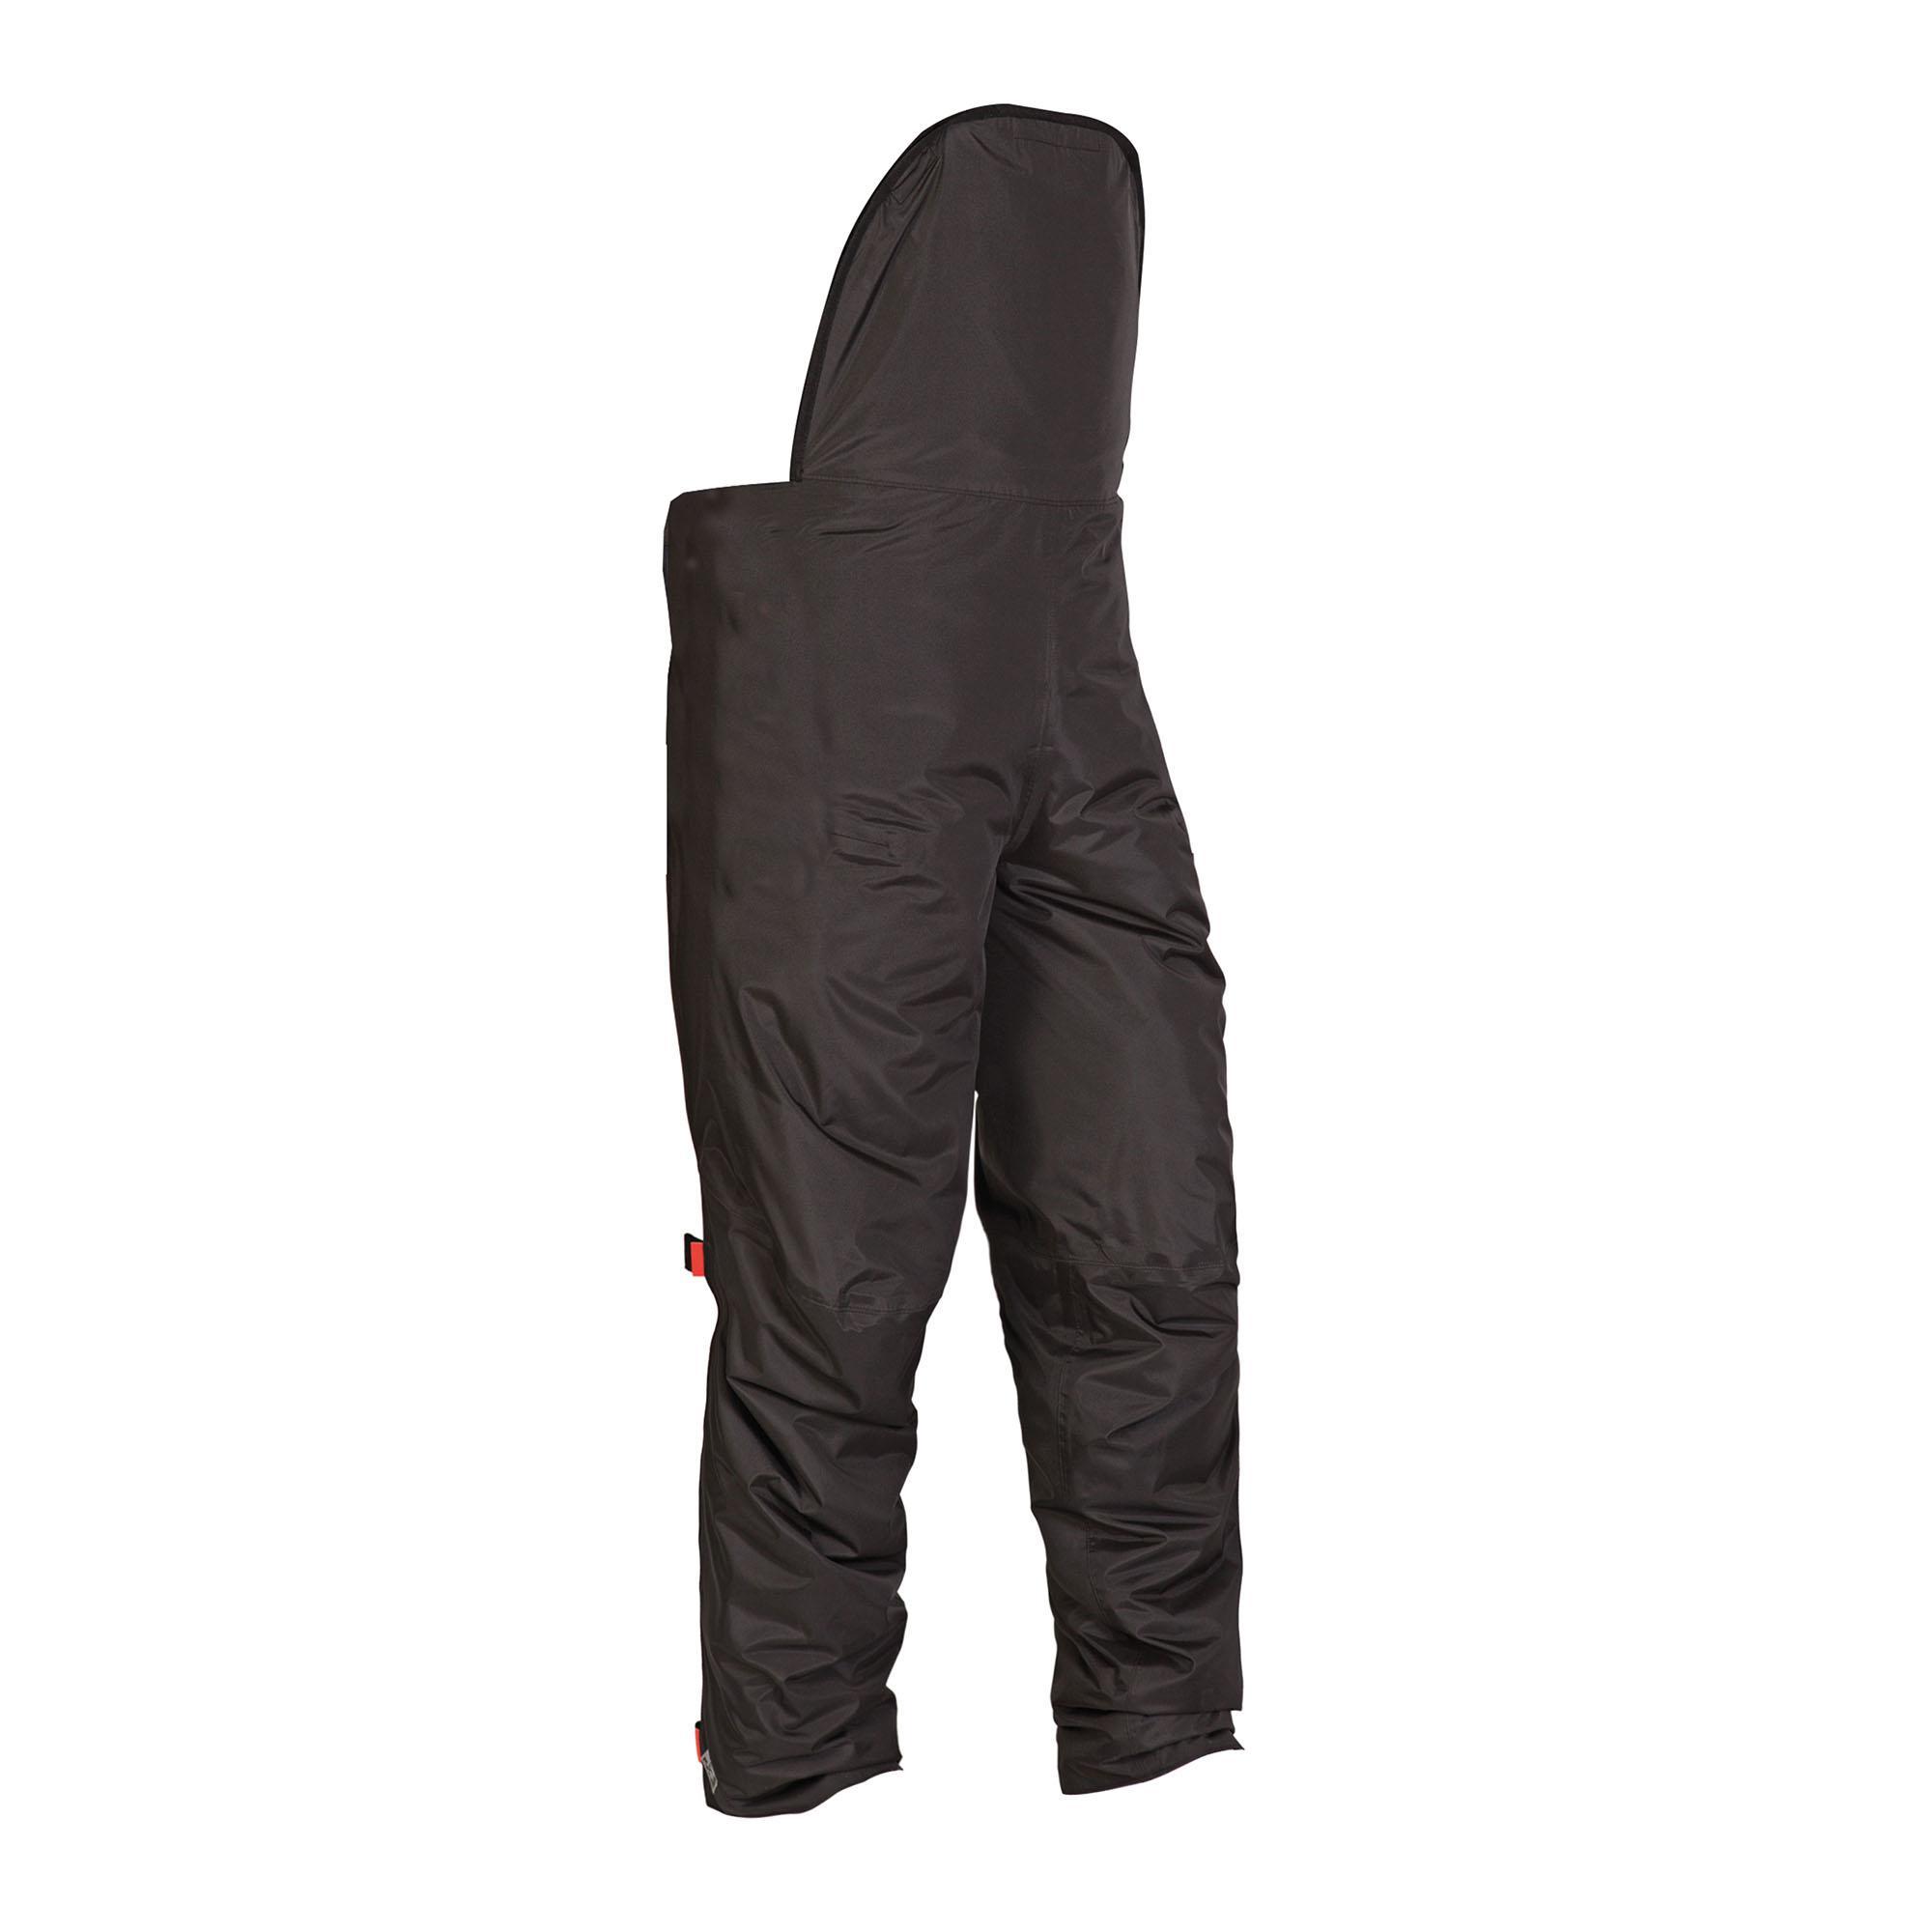 Leg Cover Panta-fast Black